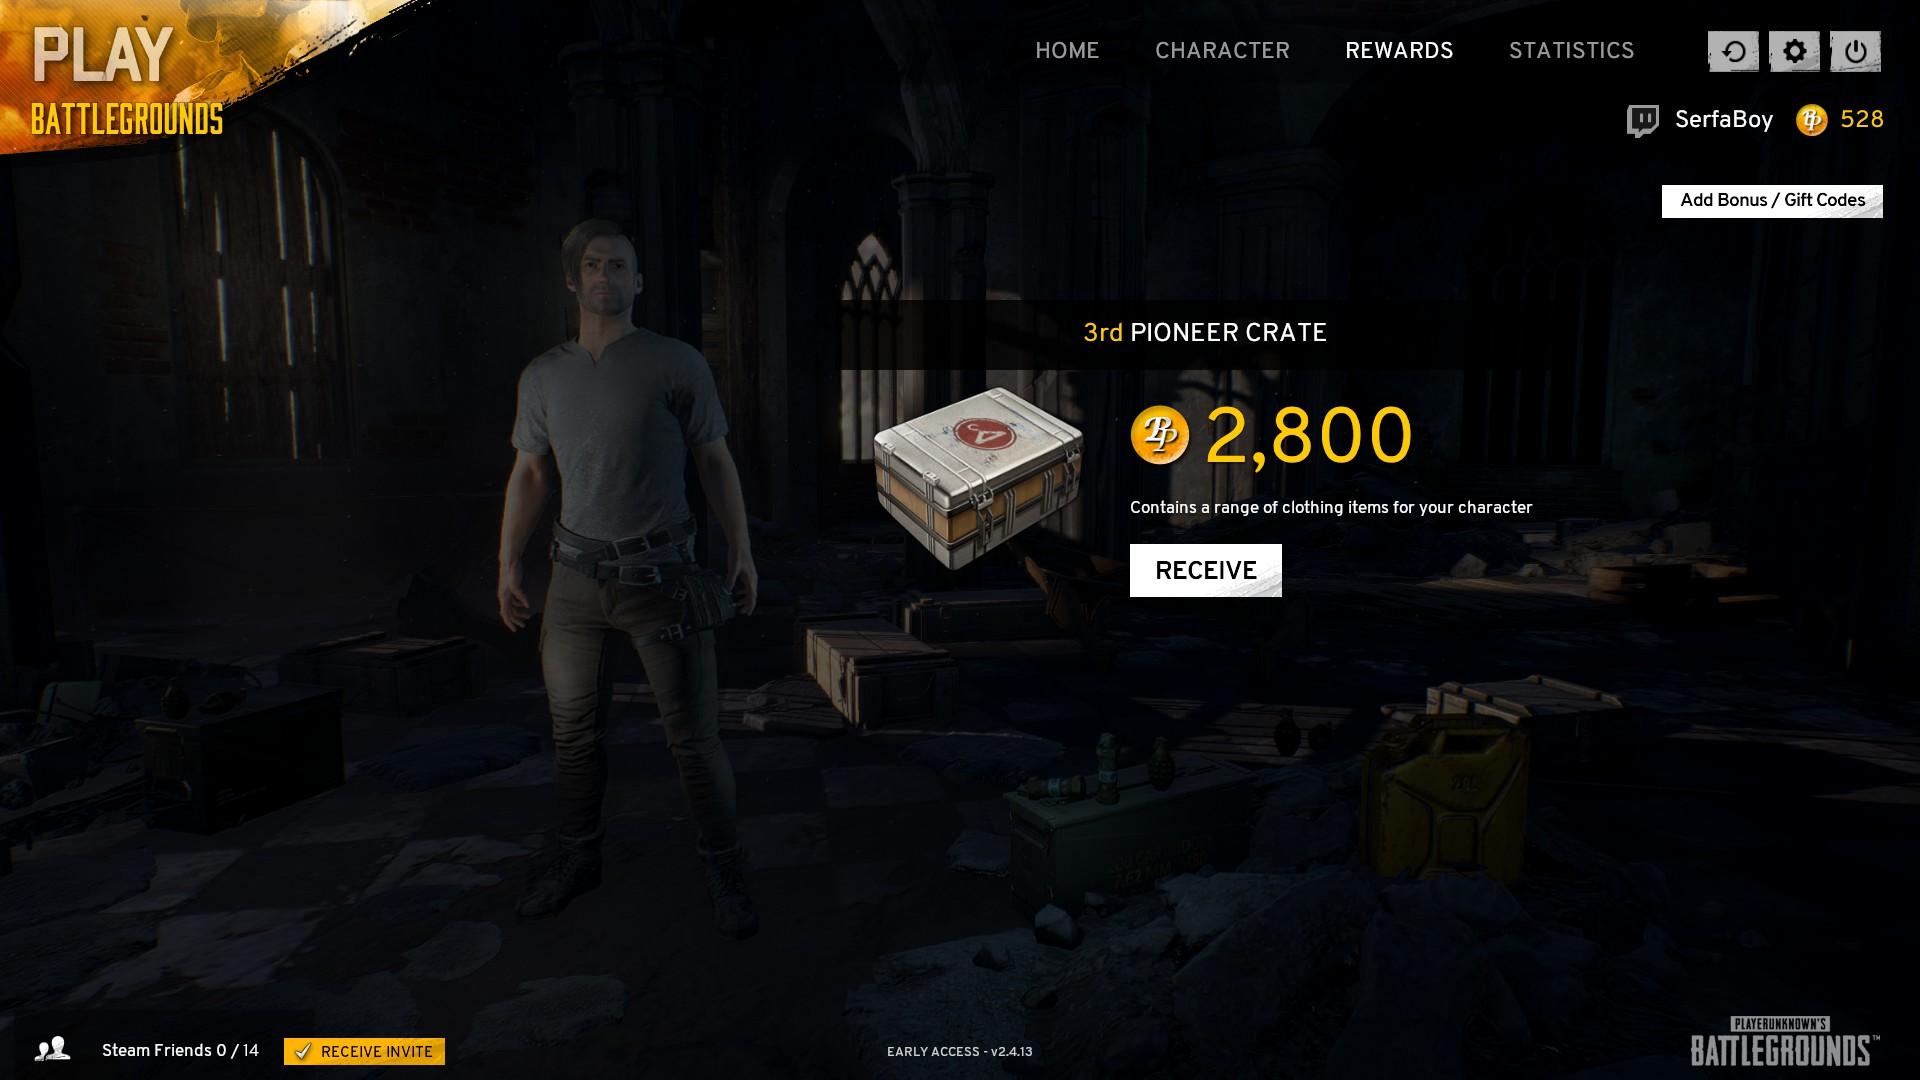 Battlegrounds Bonus Code